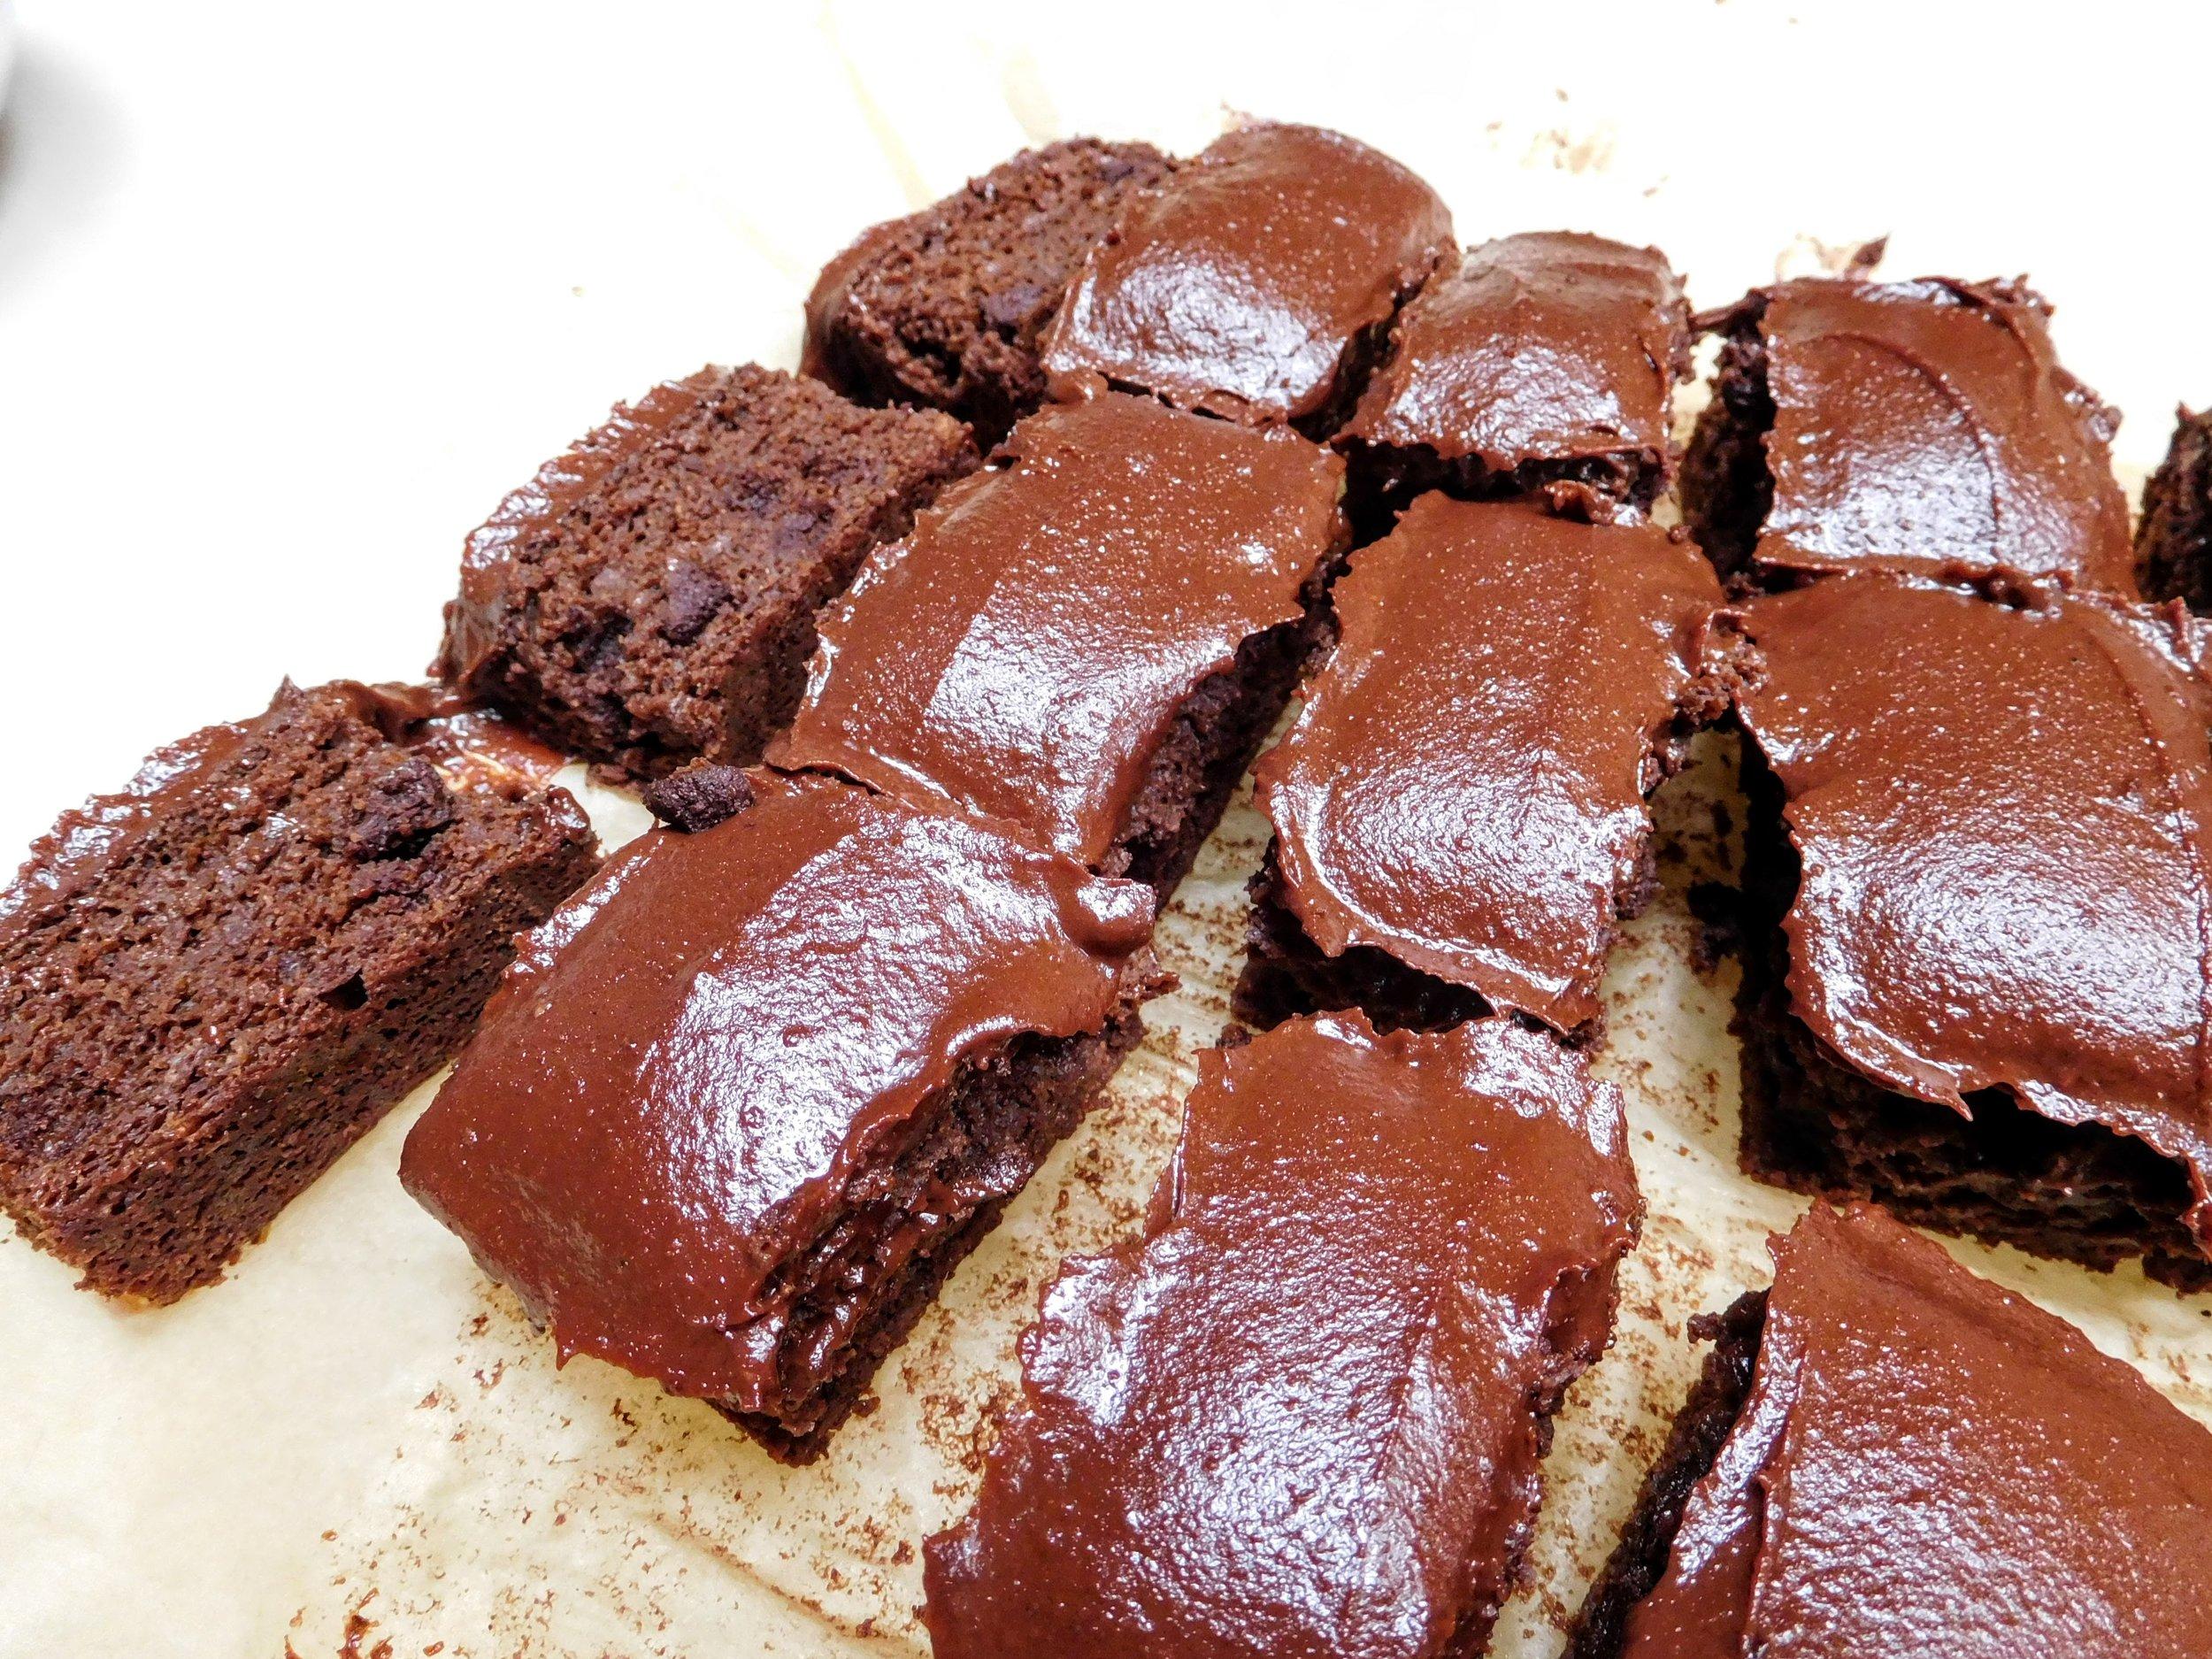 cho sweet pot cake bites.JPG